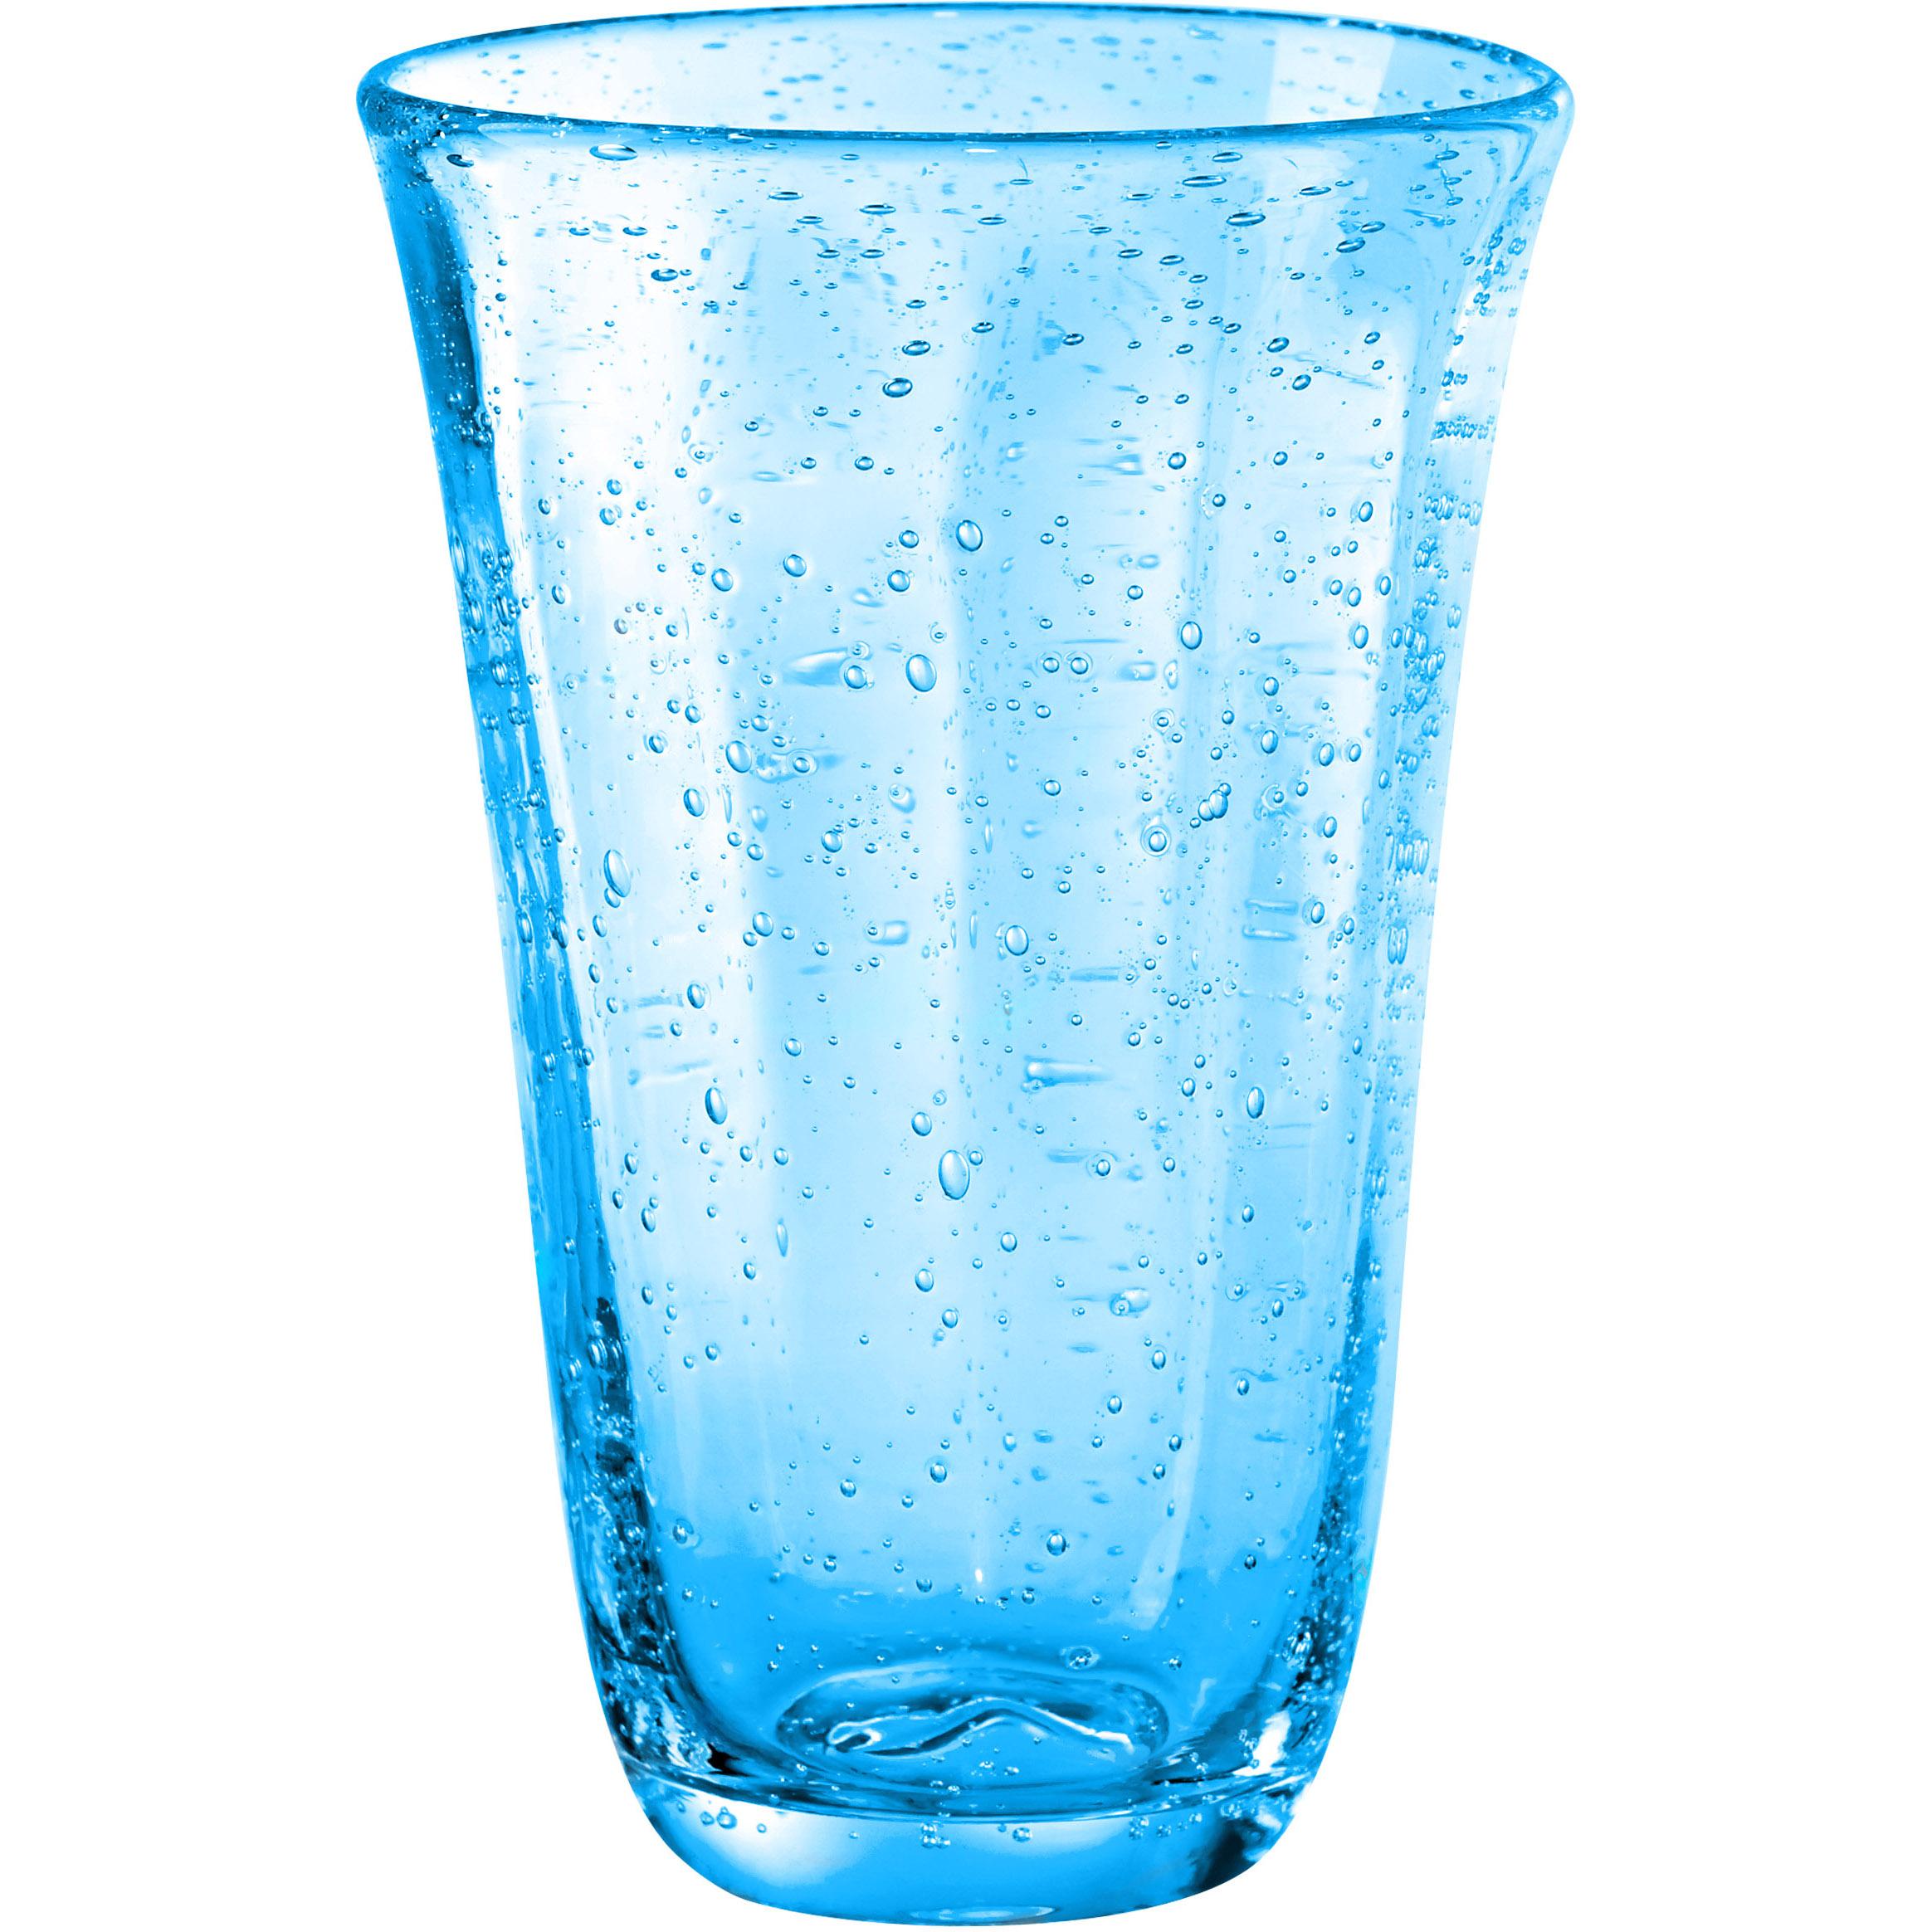 Artland Savannah Turquoise Bubble Glass 18 Ounce Highball Tumbler